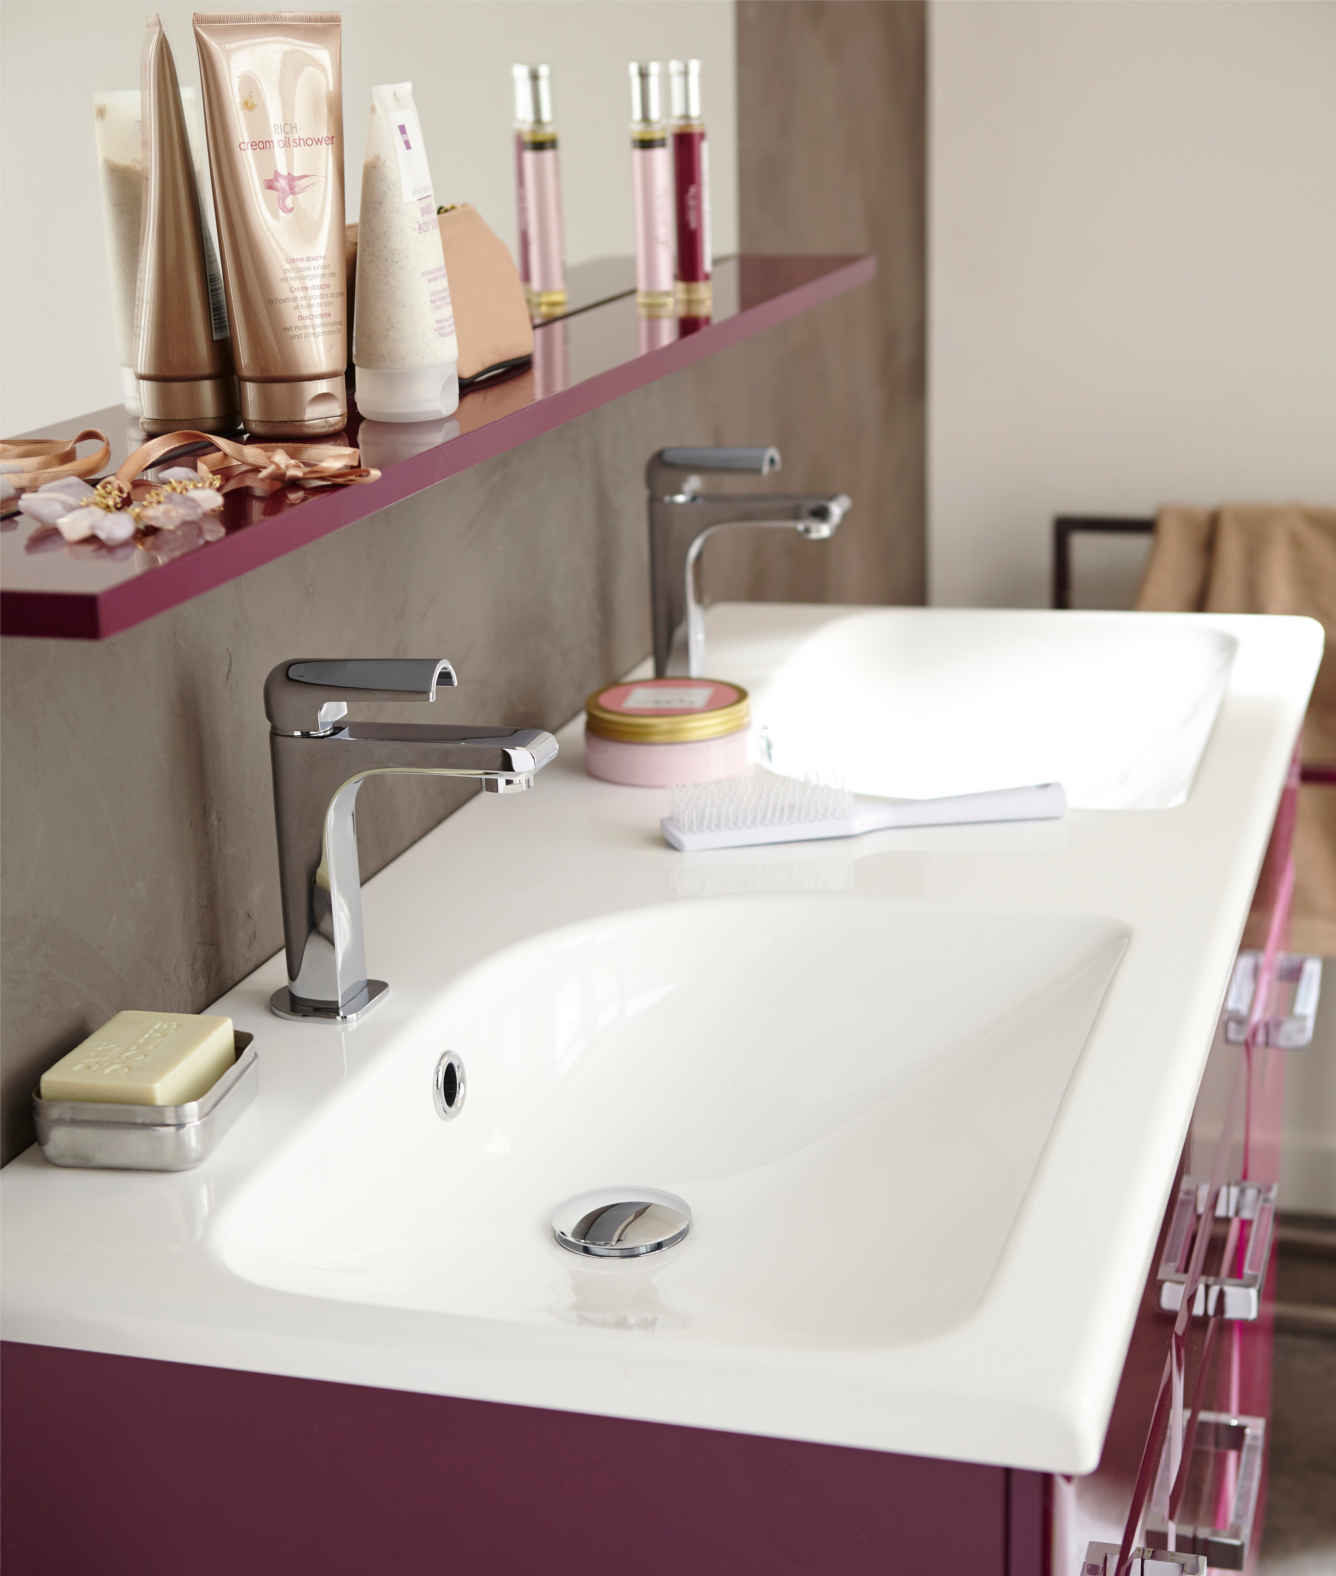 vasques castorama radiateur salle de bain castorama u salle de bains le verre matriau vasques. Black Bedroom Furniture Sets. Home Design Ideas